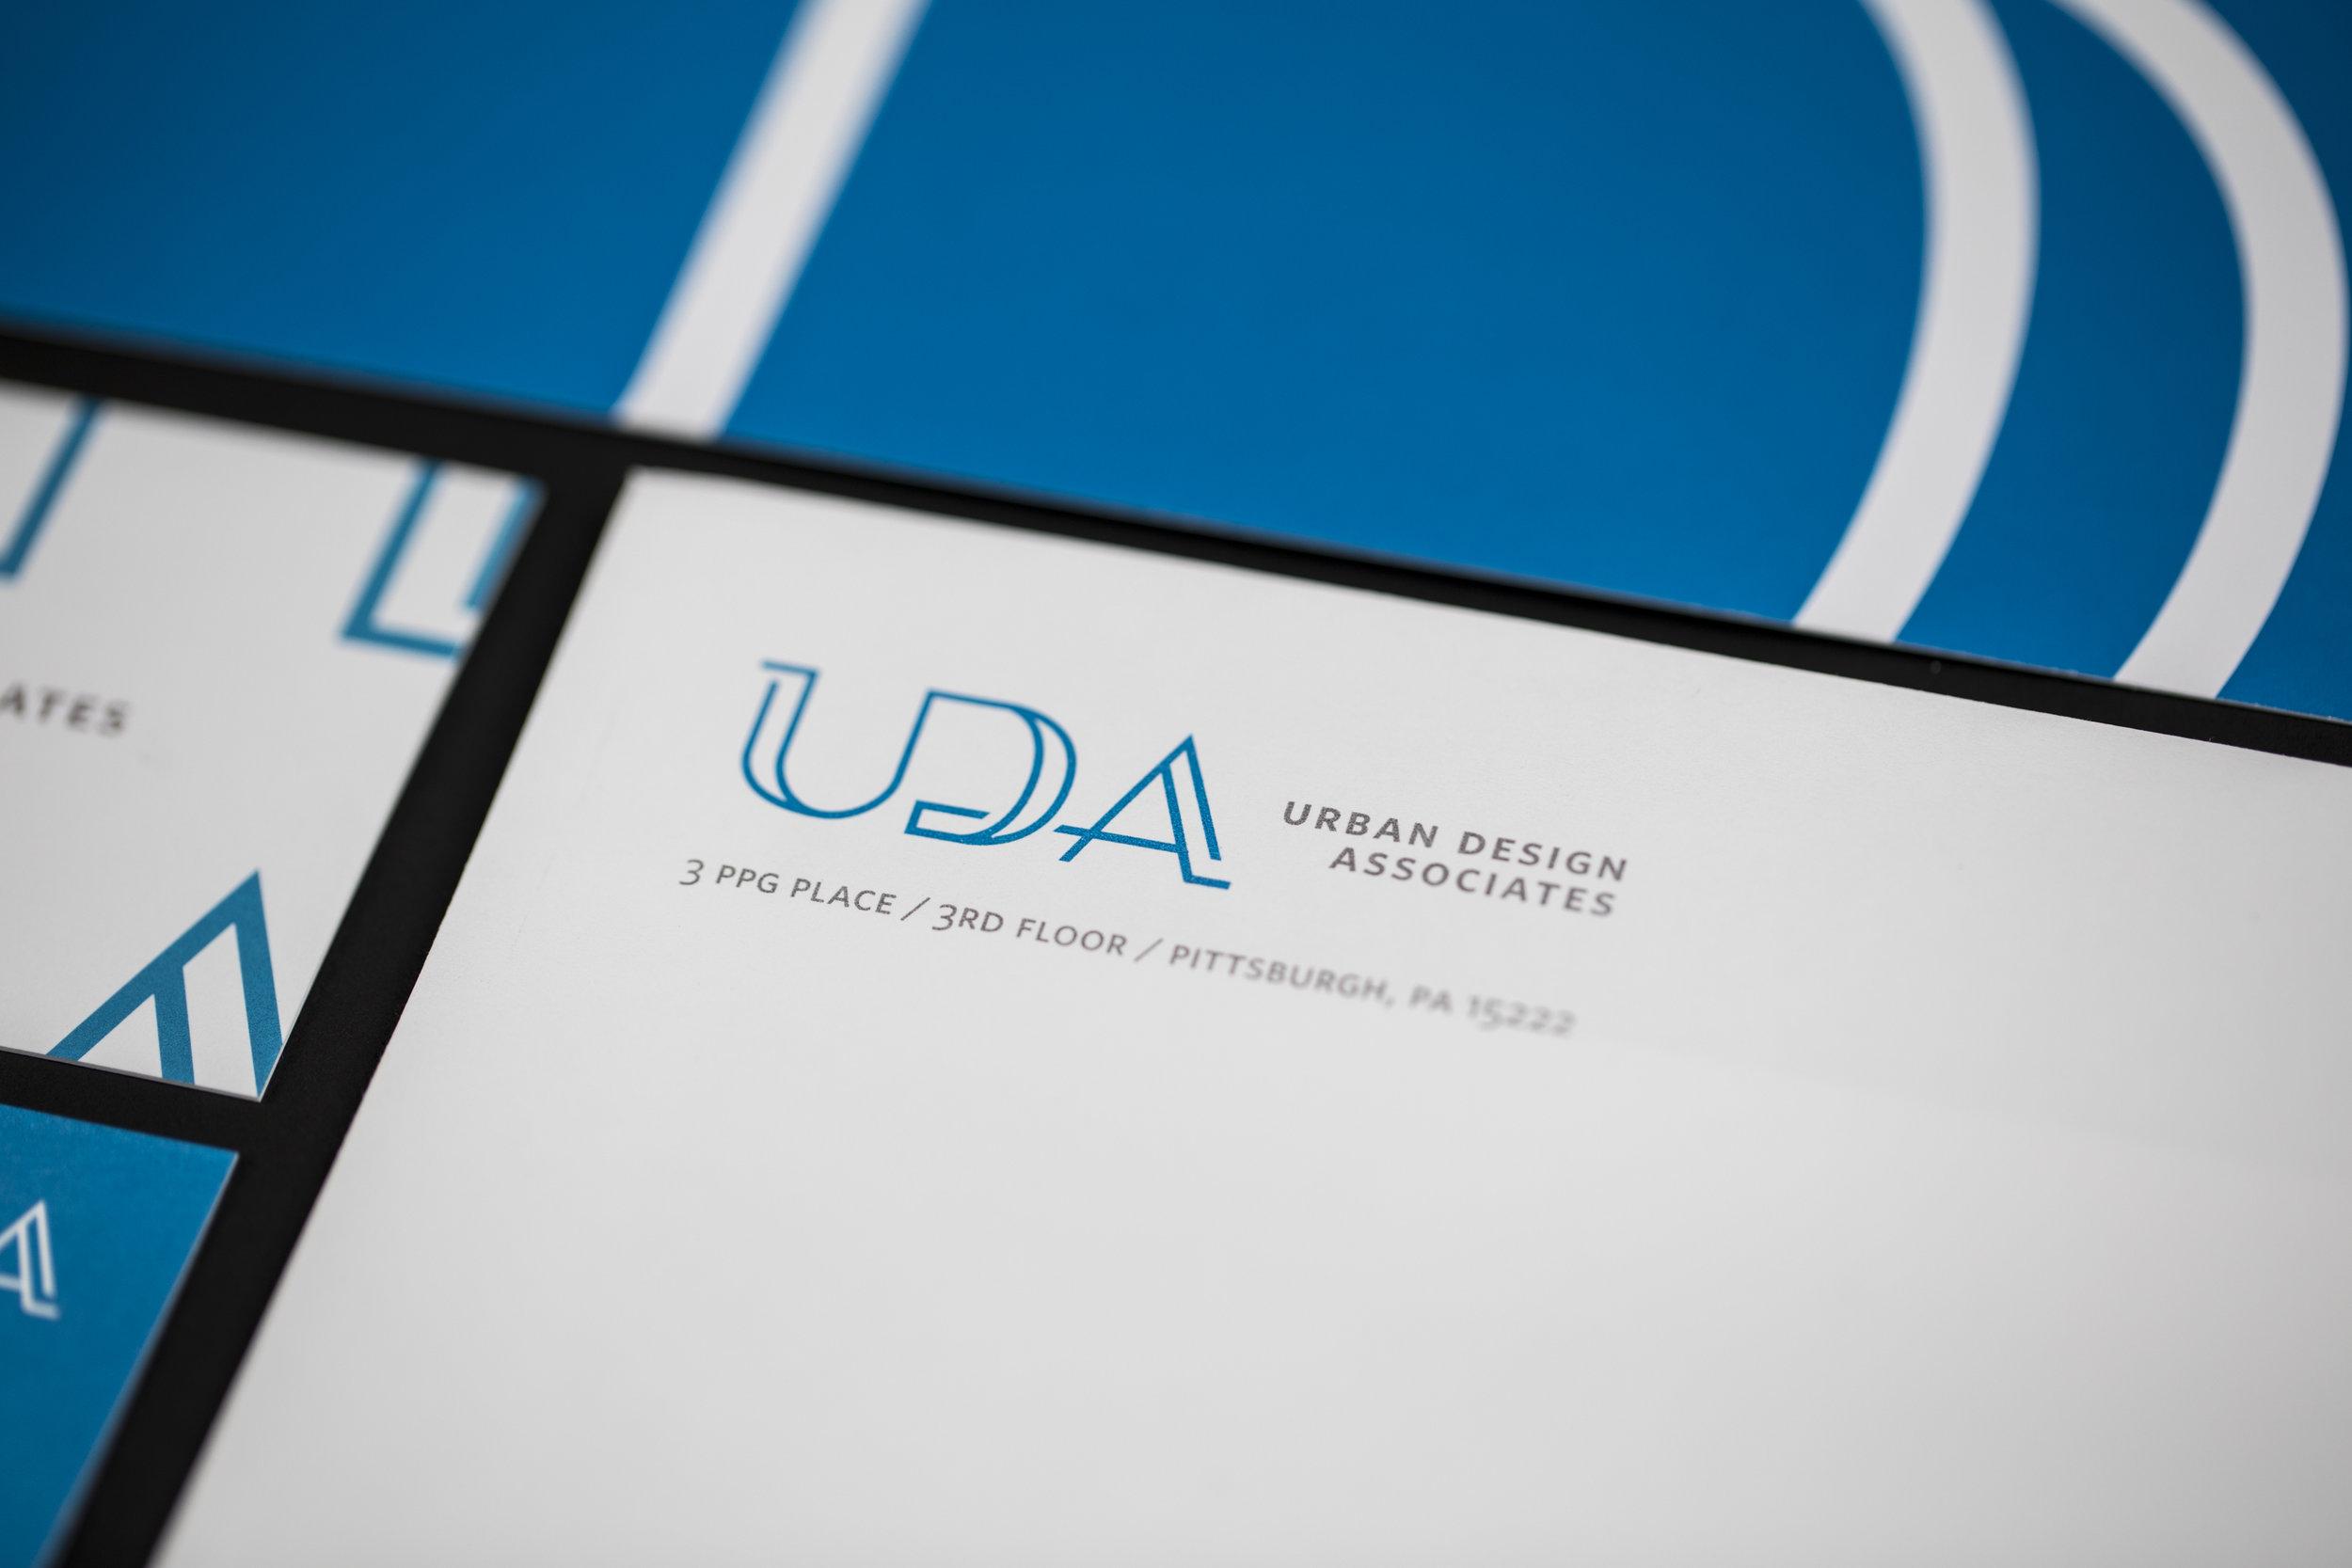 Design-and-Architcture_Branding_Urban-Design-Associates_Bootstrap-Design-Co_Stationary-2.jpg